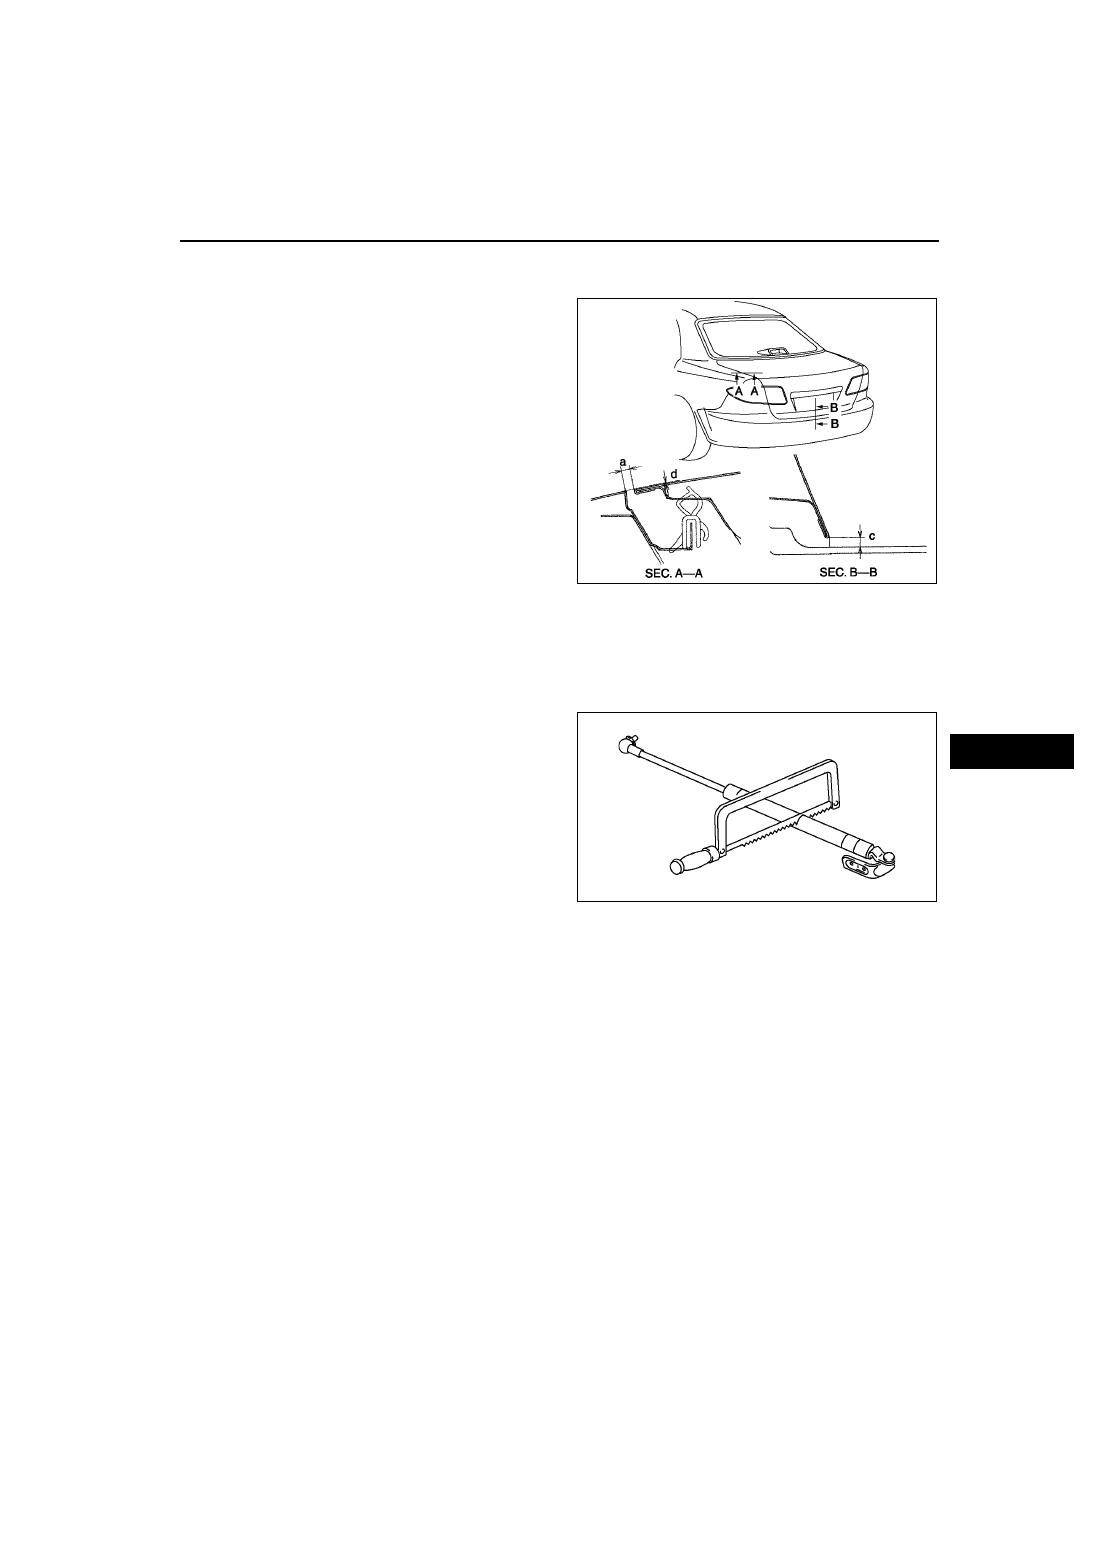 Mazda 3 Service Manual: Trunk Lid Stay Damper Disposal